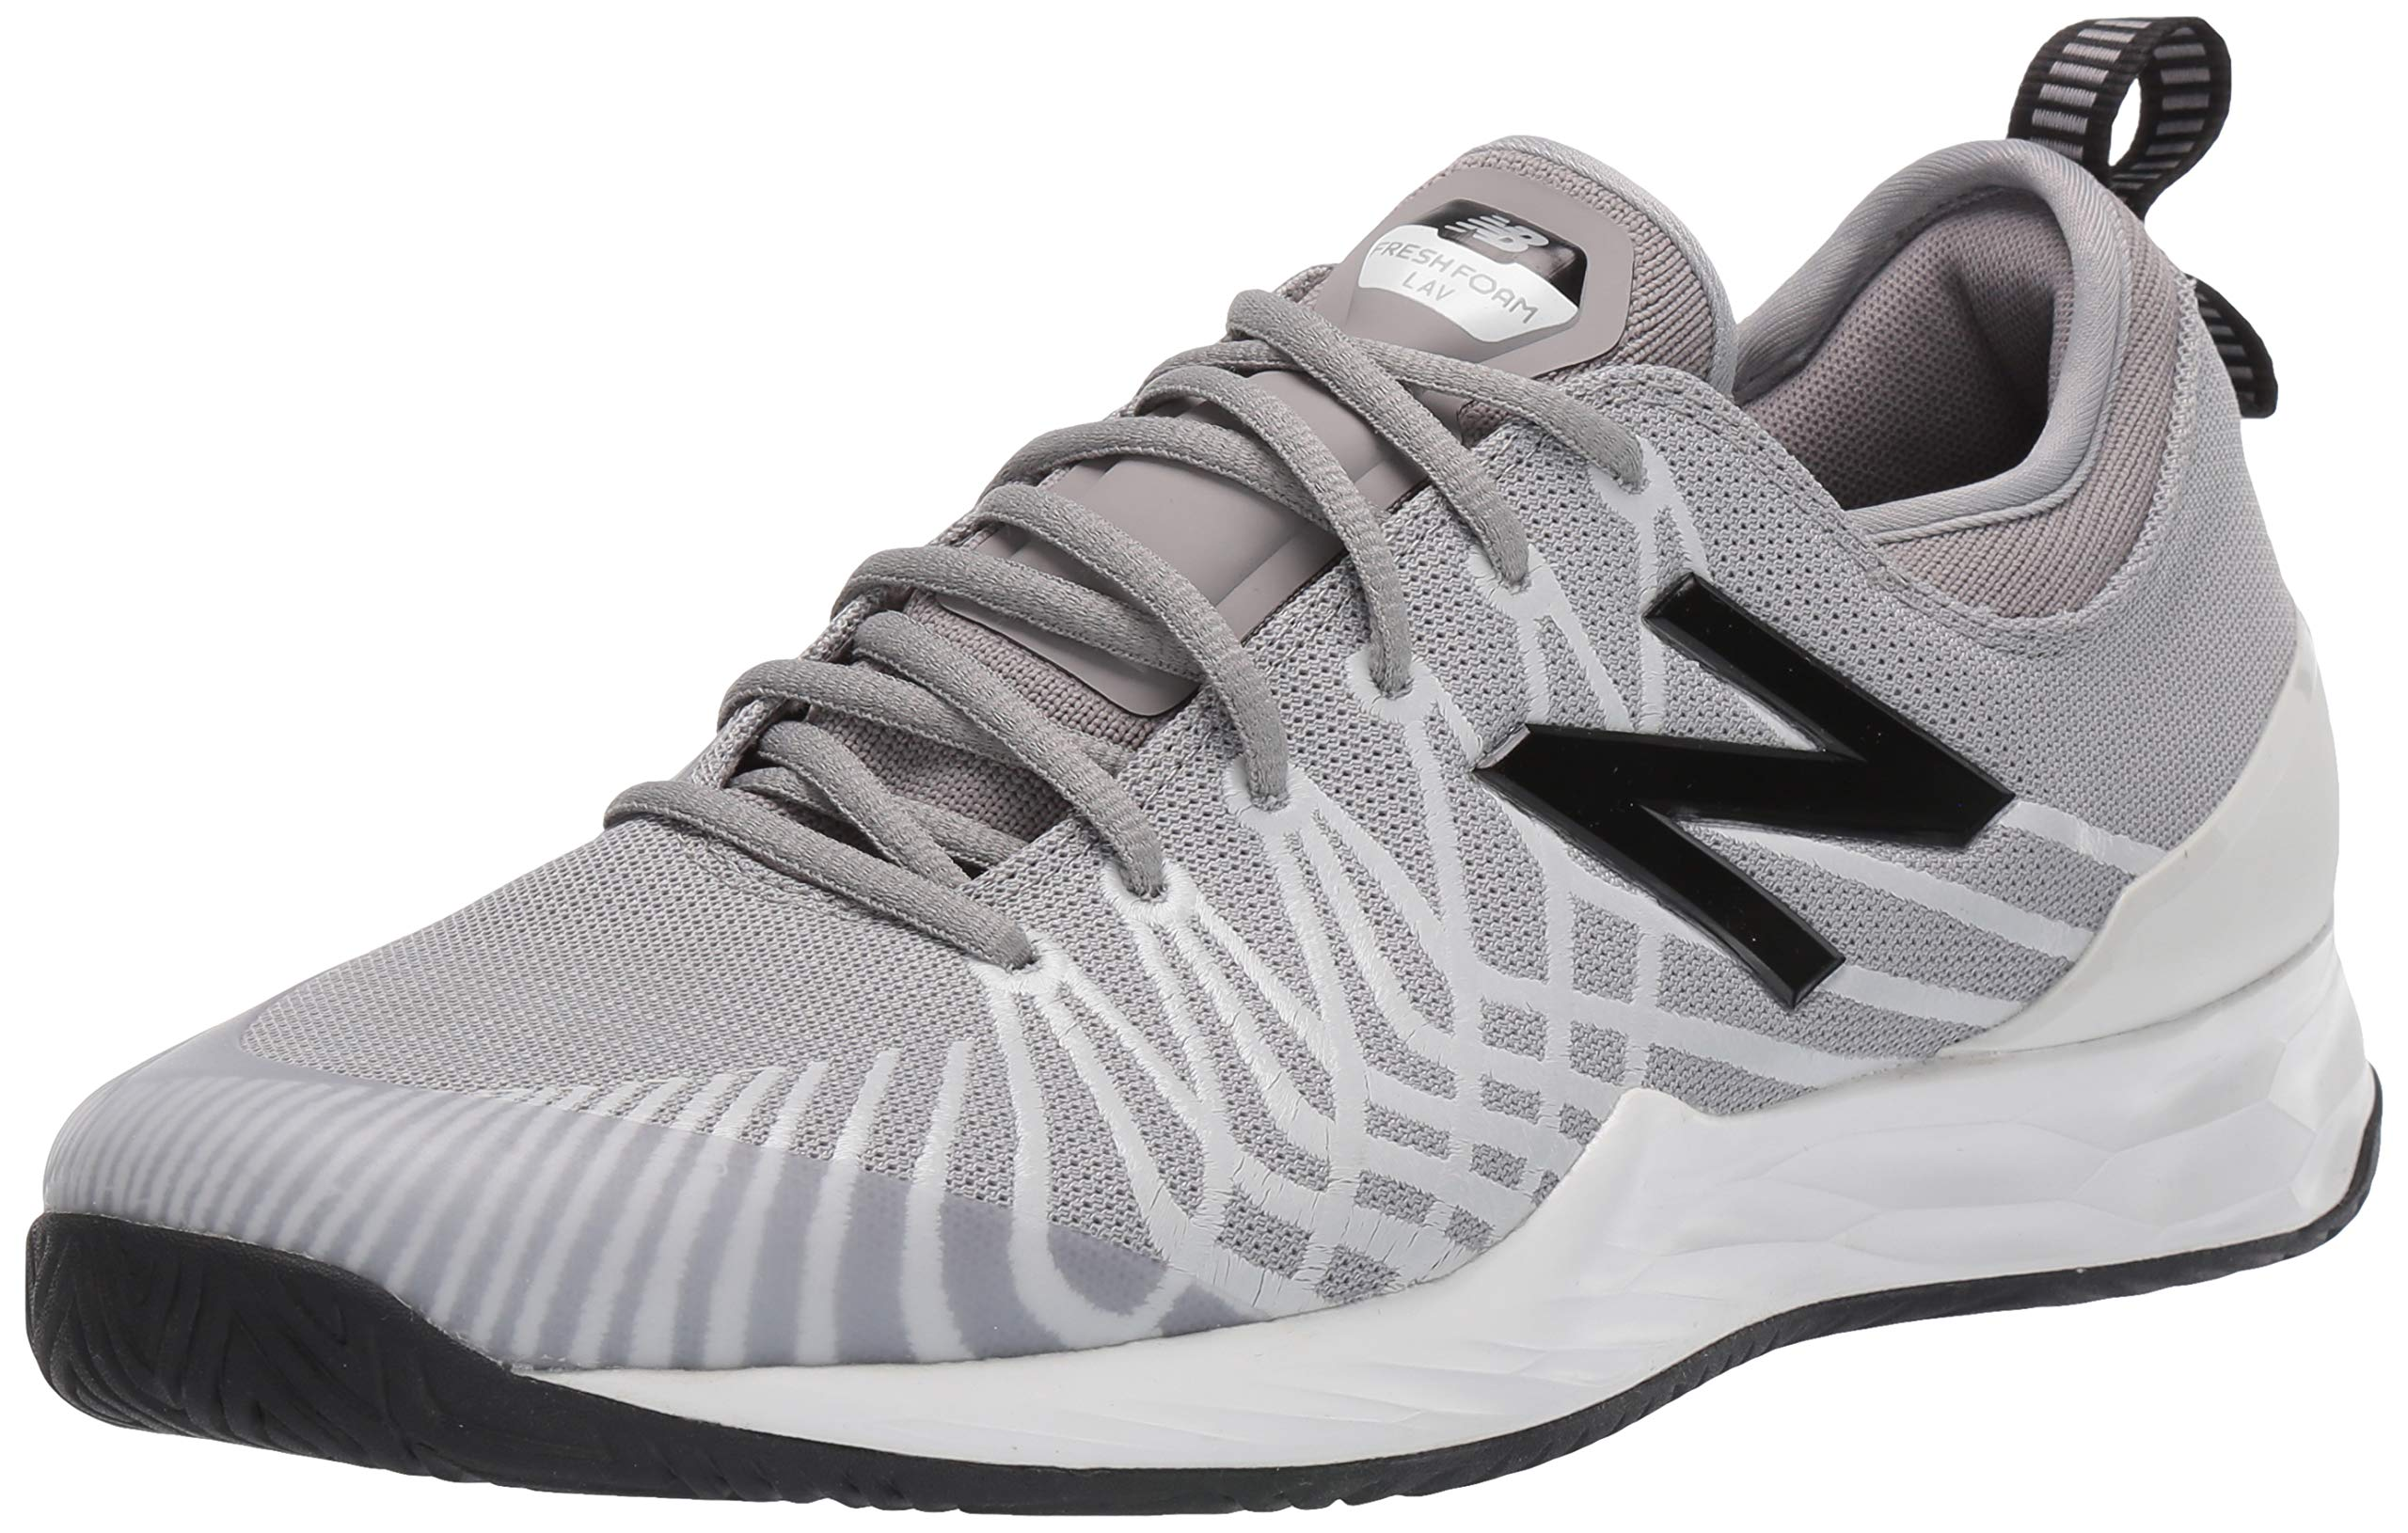 New Balance Men's LAV V1 Hard Court Tennis Shoe, Marblehead/Black, 12 D US by New Balance